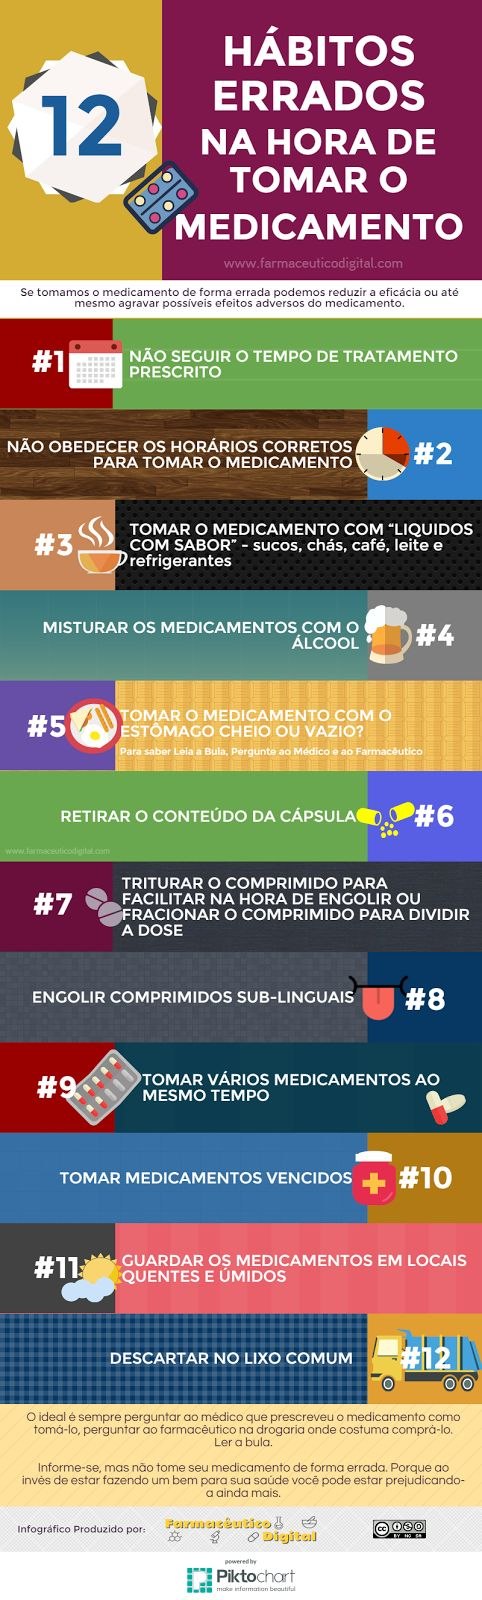 12 Hábitos Errados na Hora de Tomar o Medicamento